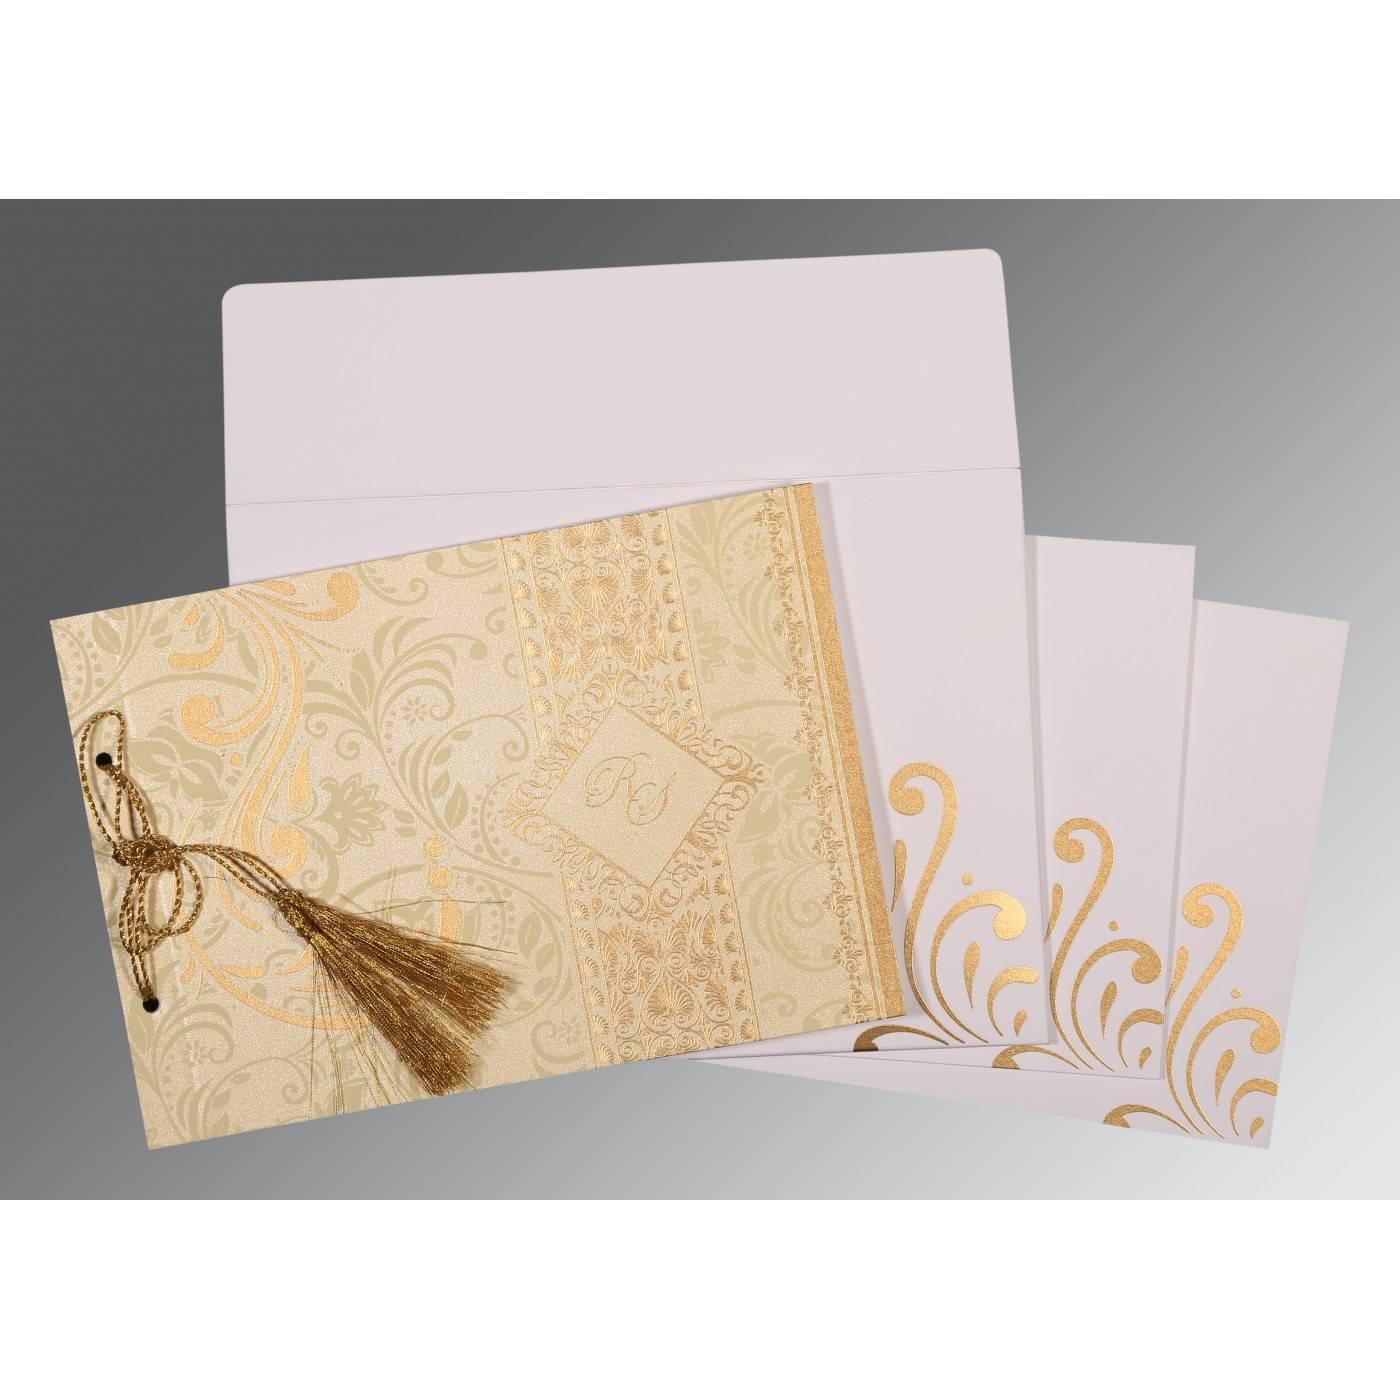 CHAMOISEE SHIMMERY SCREEN PRINTED WEDDING CARD : CW-8223L - IndianWeddingCards